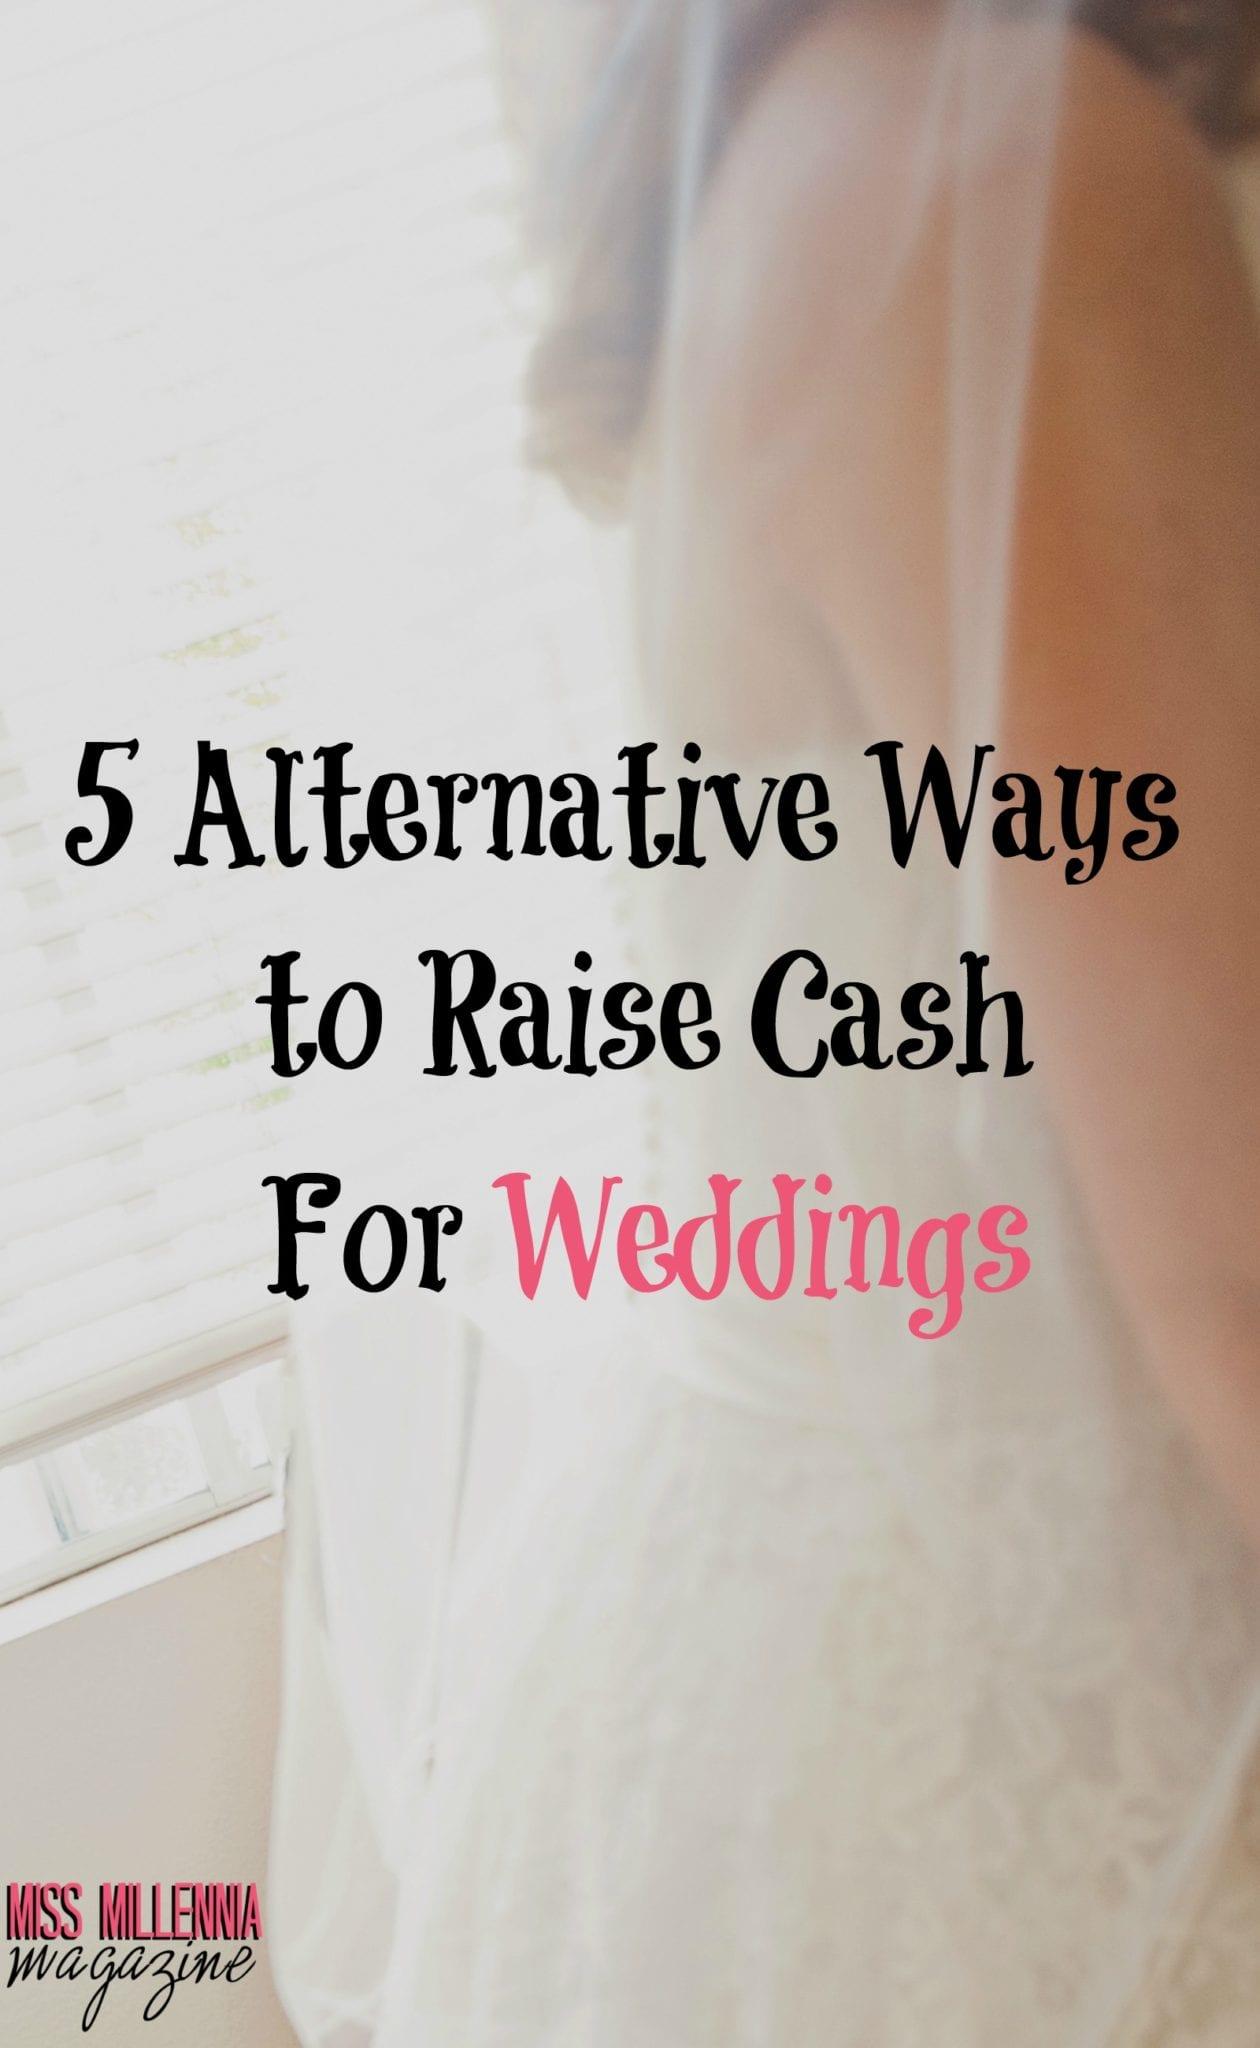 5 Alternative Ways to Raise Cash For Weddings